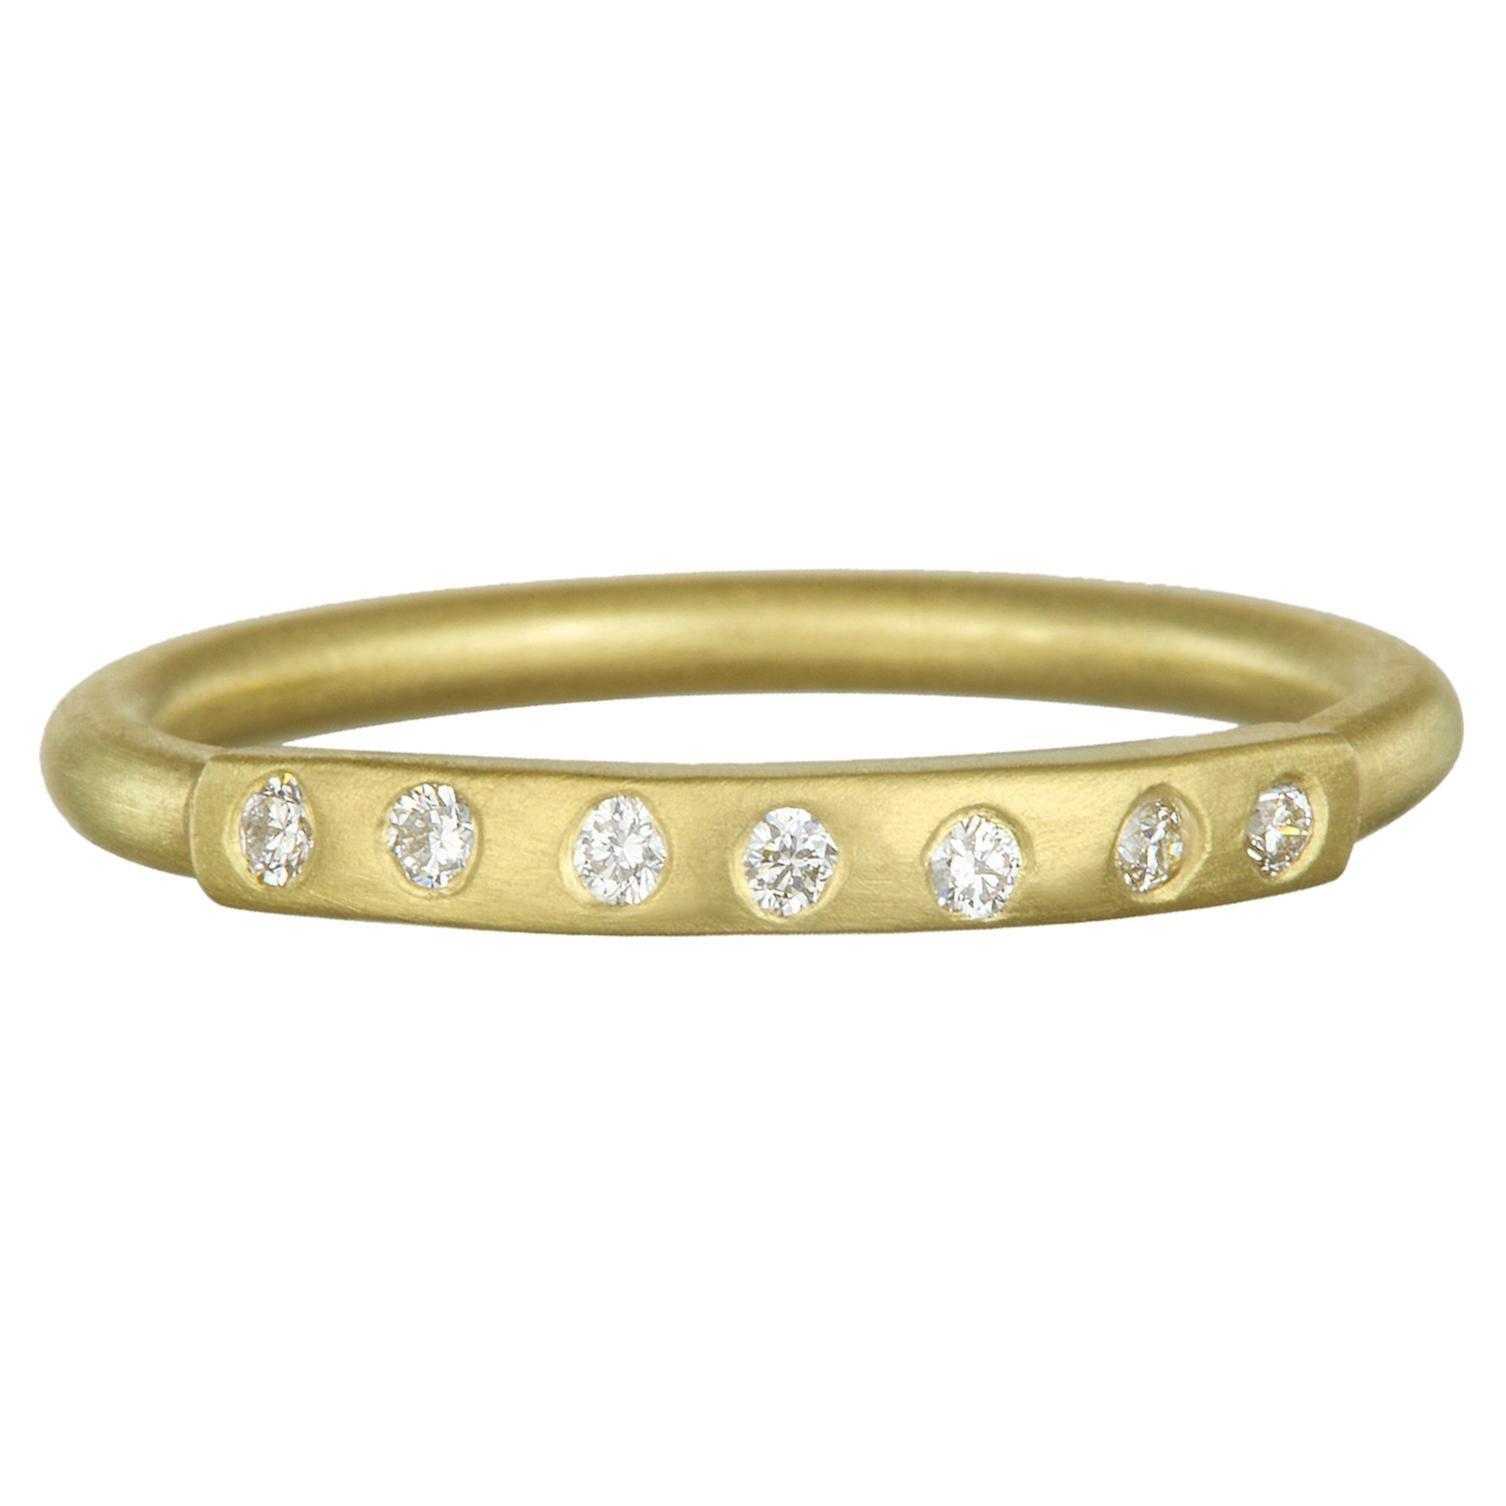 2f0c5264a7e7a Faye Kim 18 Karat Gold Yellow Sapphire Bar Stack Ring